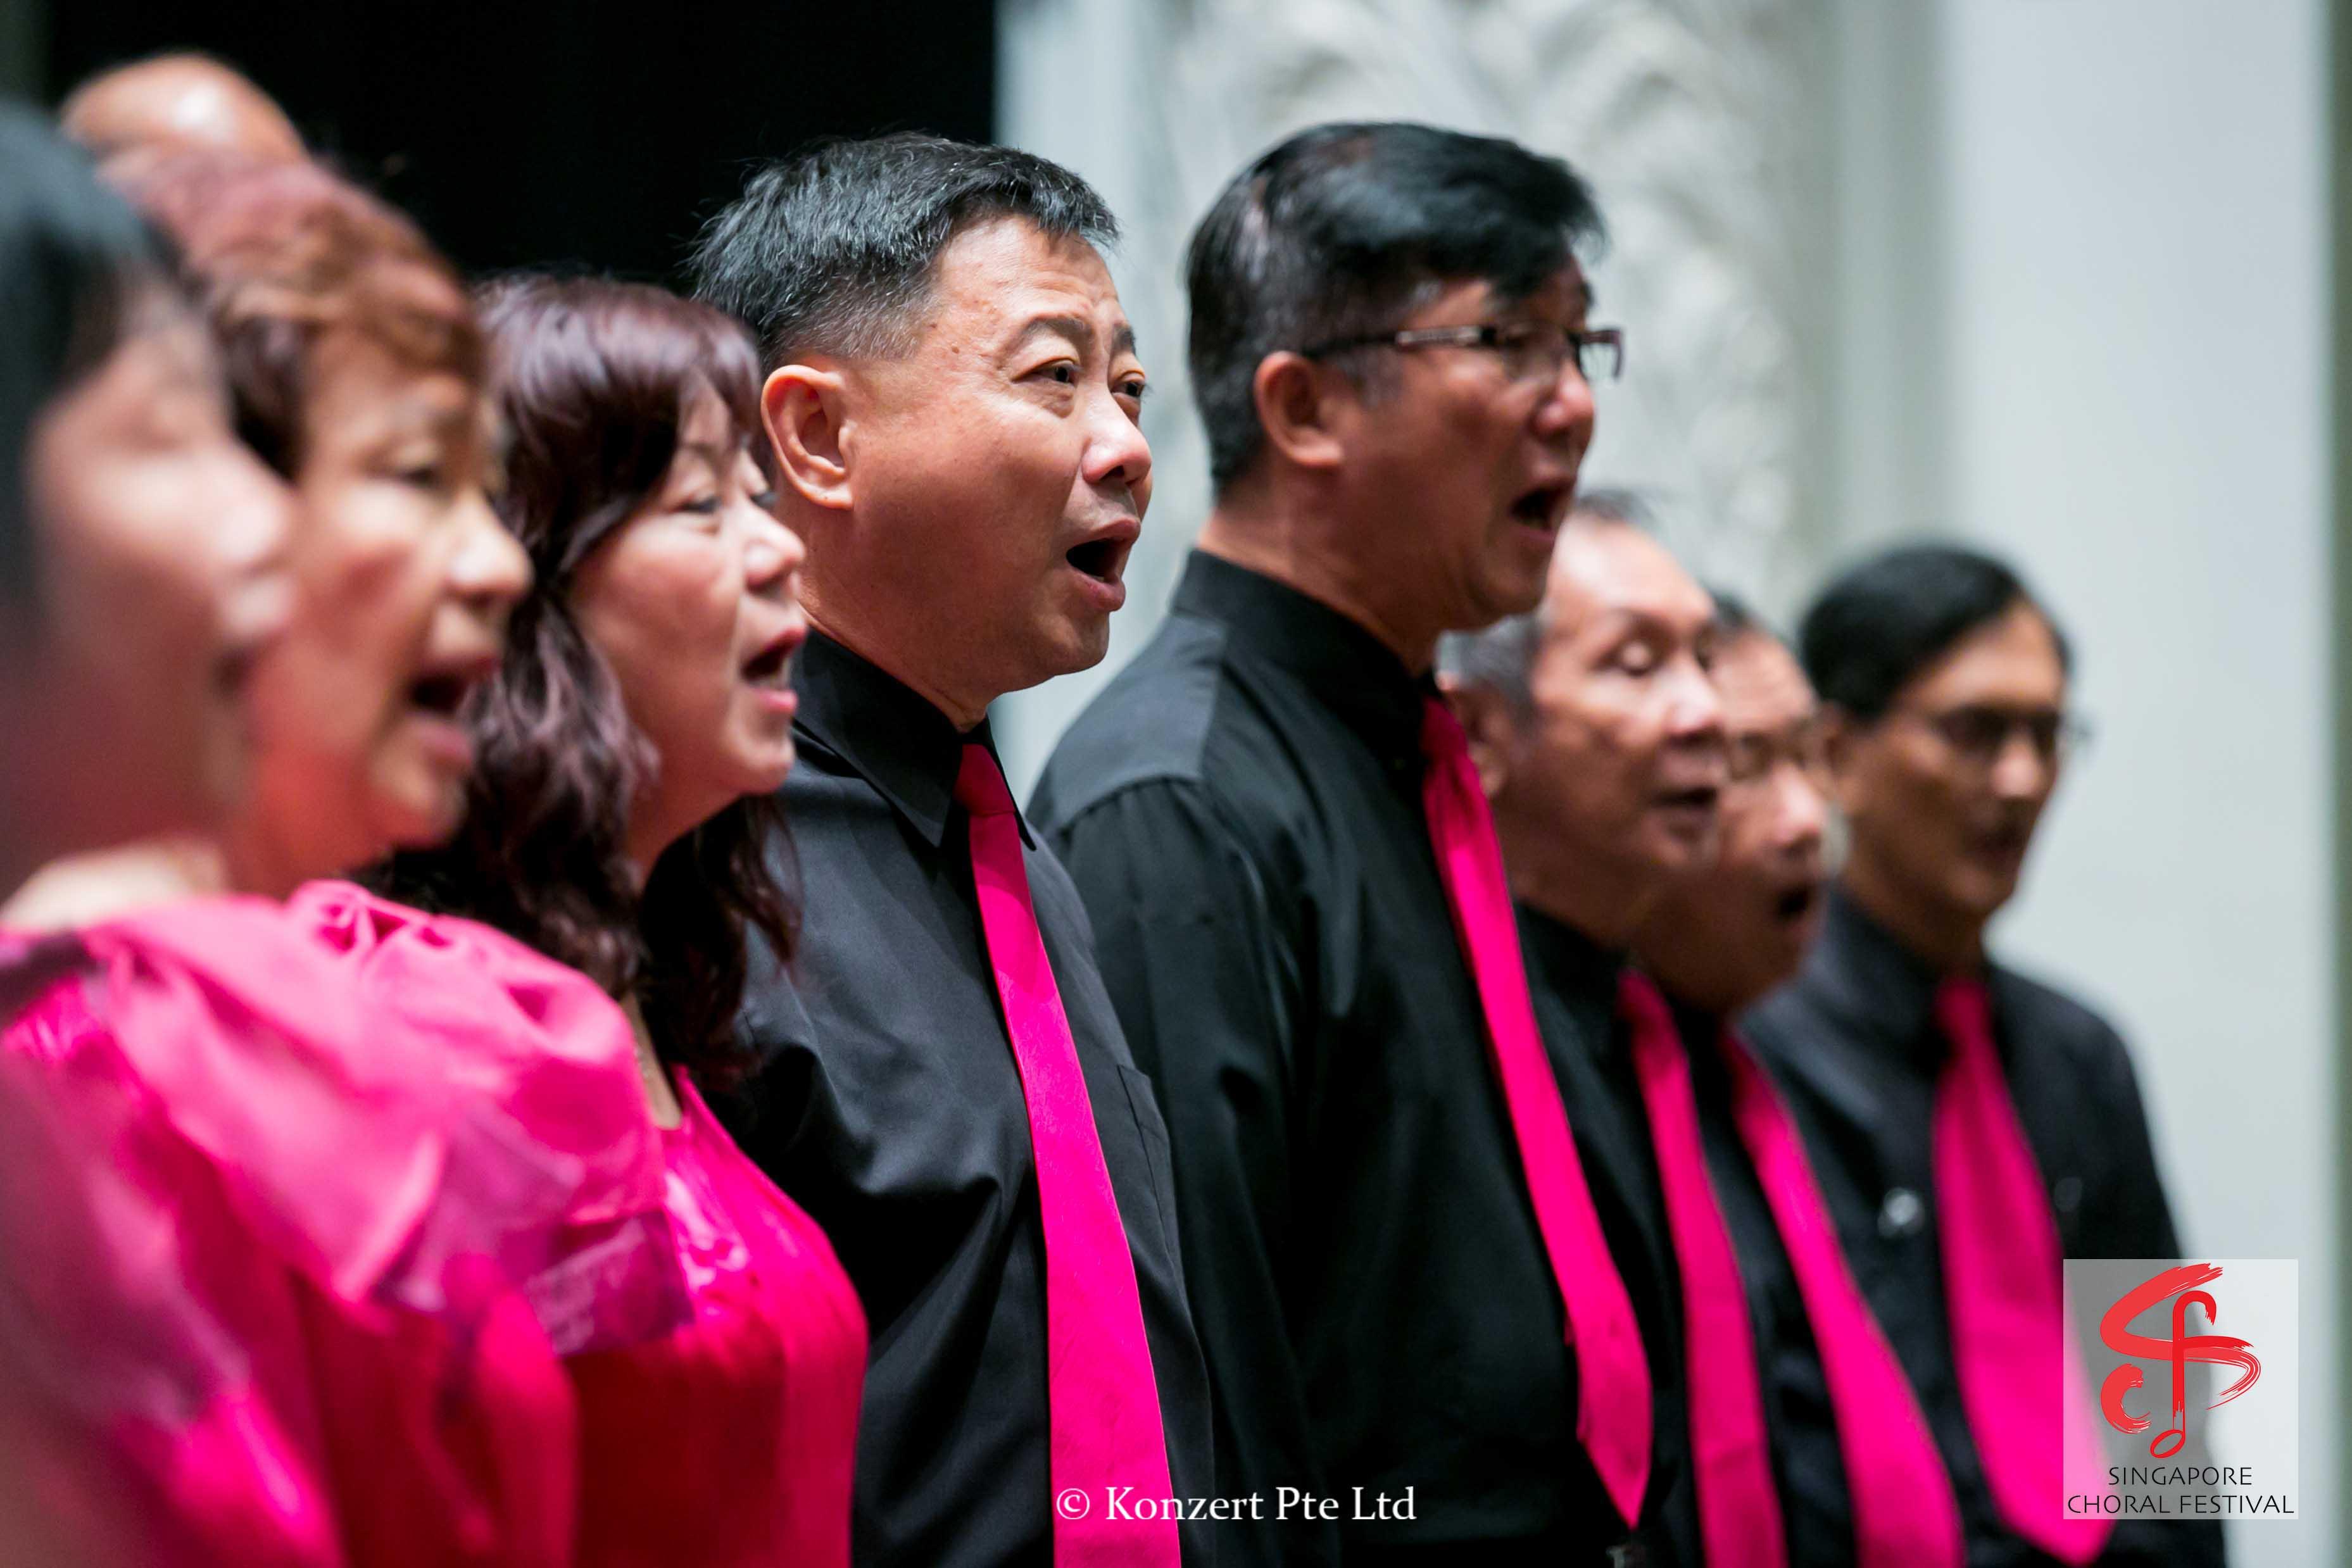 Singapore Choral Festival 7-8-15 (45).jpg